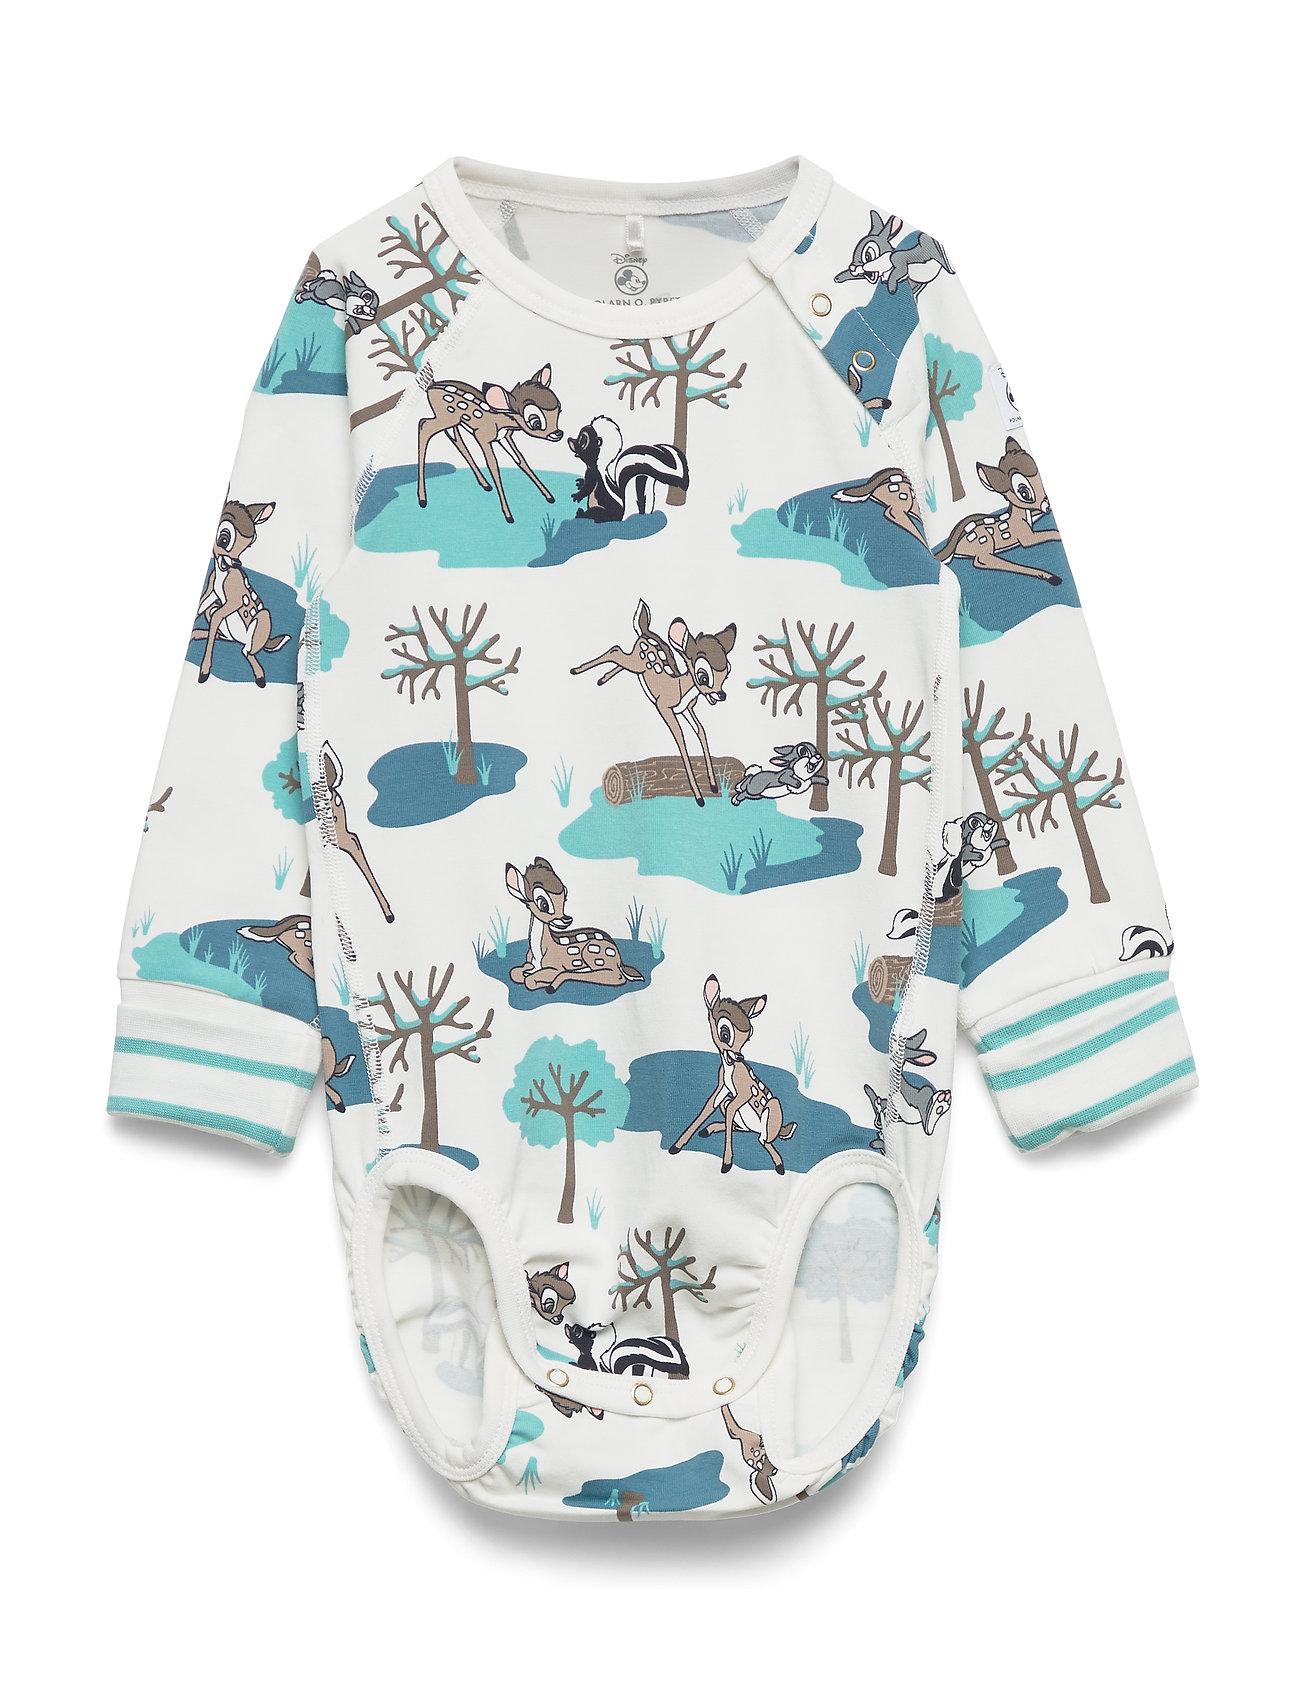 Polarn O. Pyret Body AOP Baby - MARINE BLUE